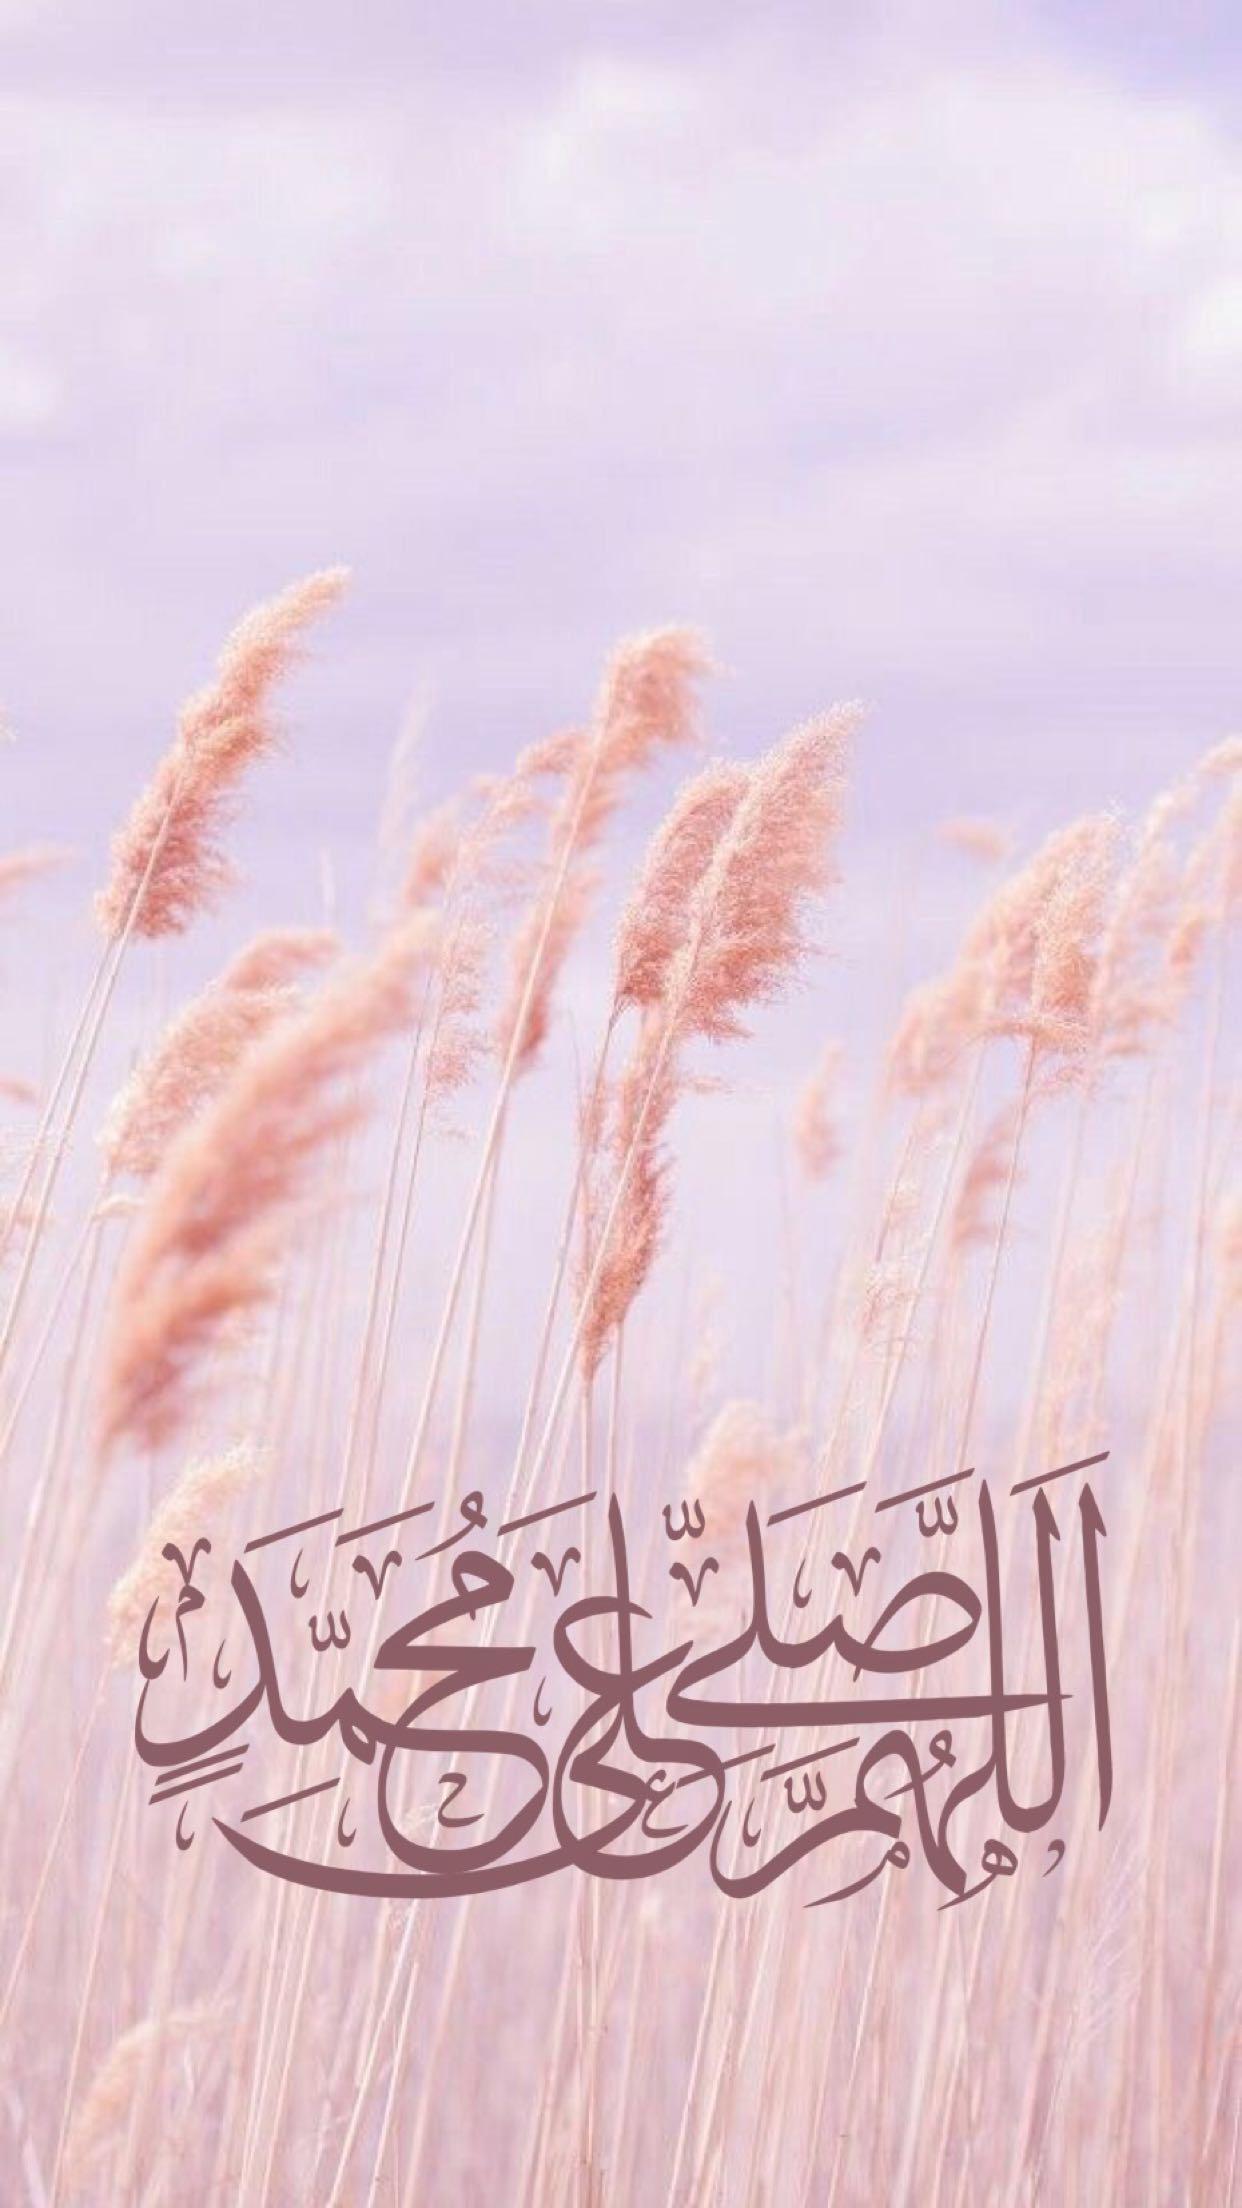 Cute Islamic Wallpaper Download Free Full Hd Wallpapers Lockscreens Islamic Wallpaper Islamic Quotes Wallpaper Islamic Wallpaper Iphone